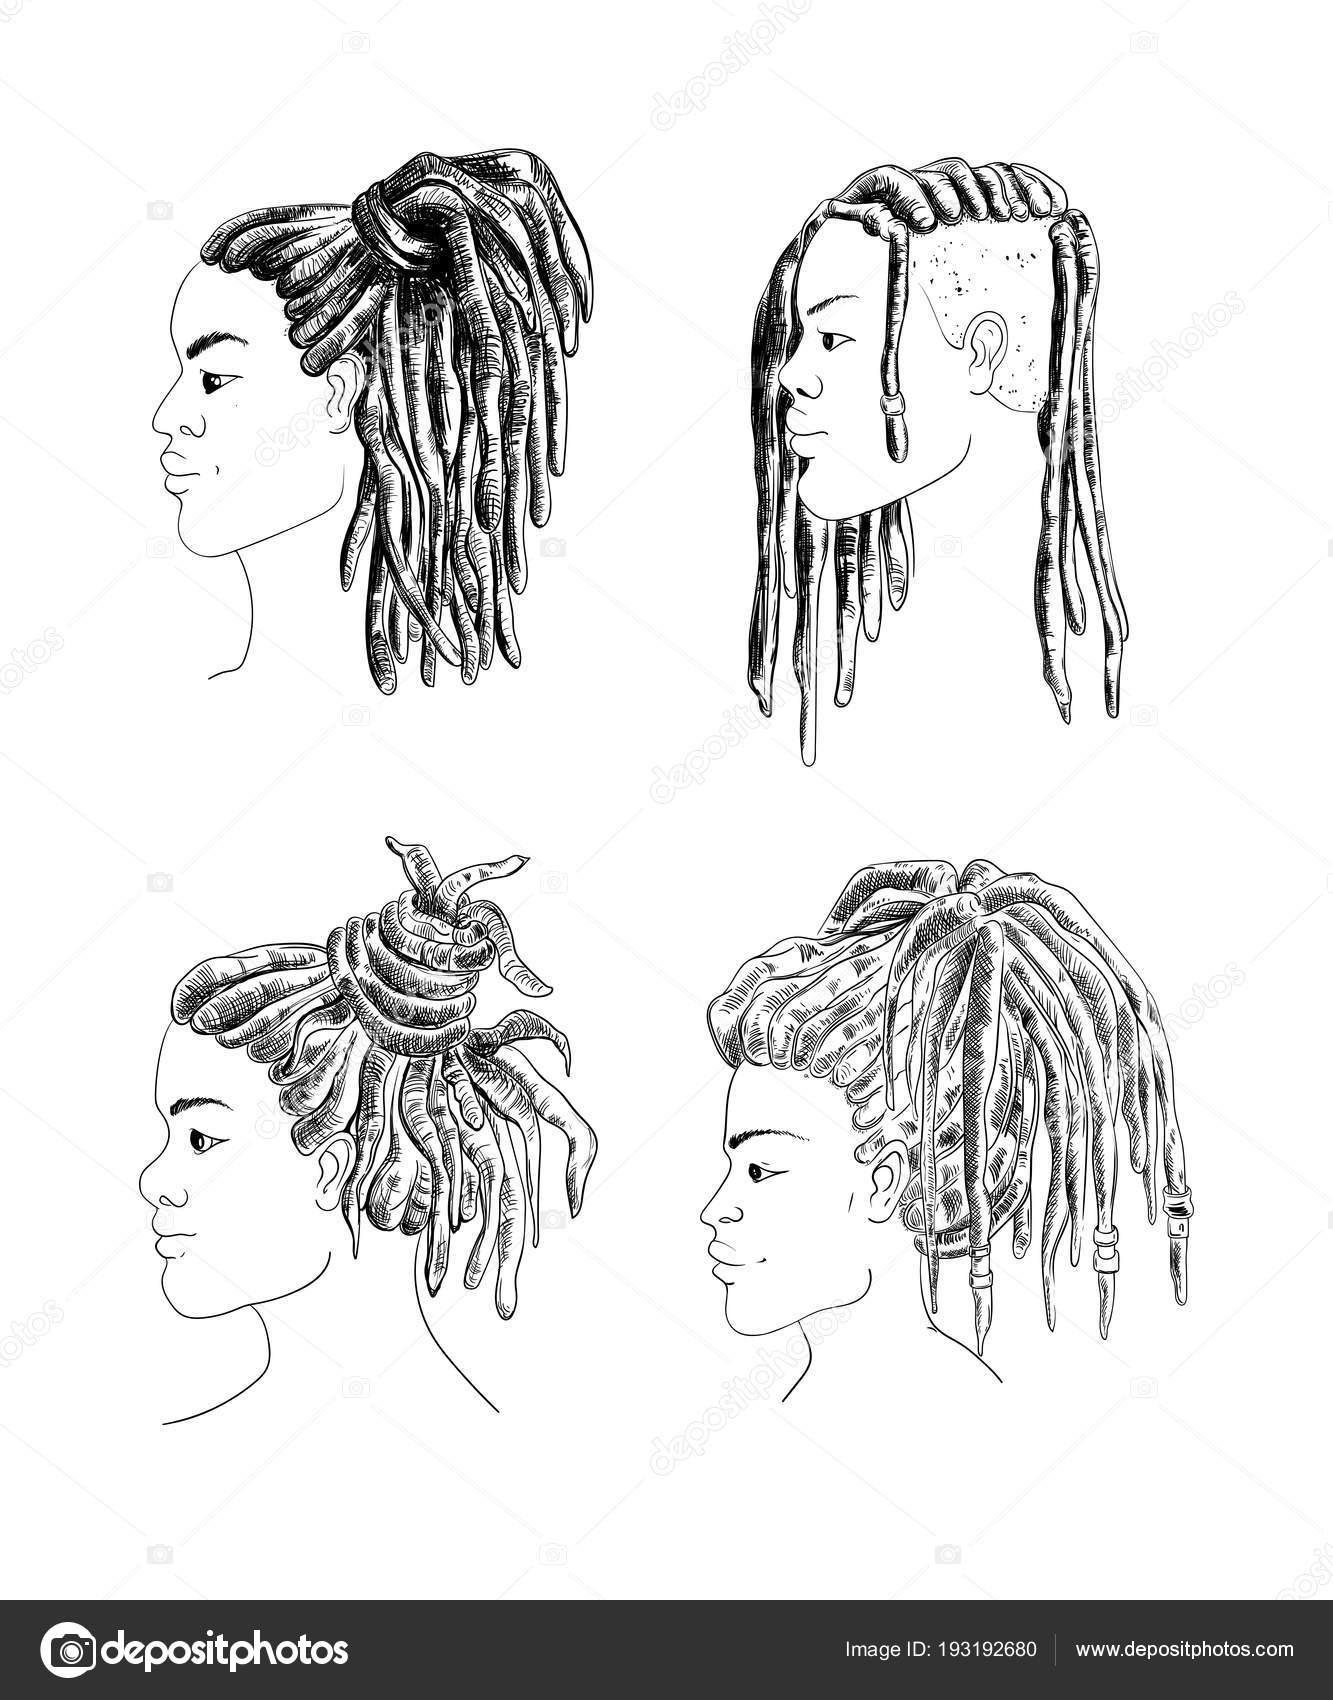 Imagenes Rastafari Para Dibujar - Wallpaperall à Dessin De Rasta